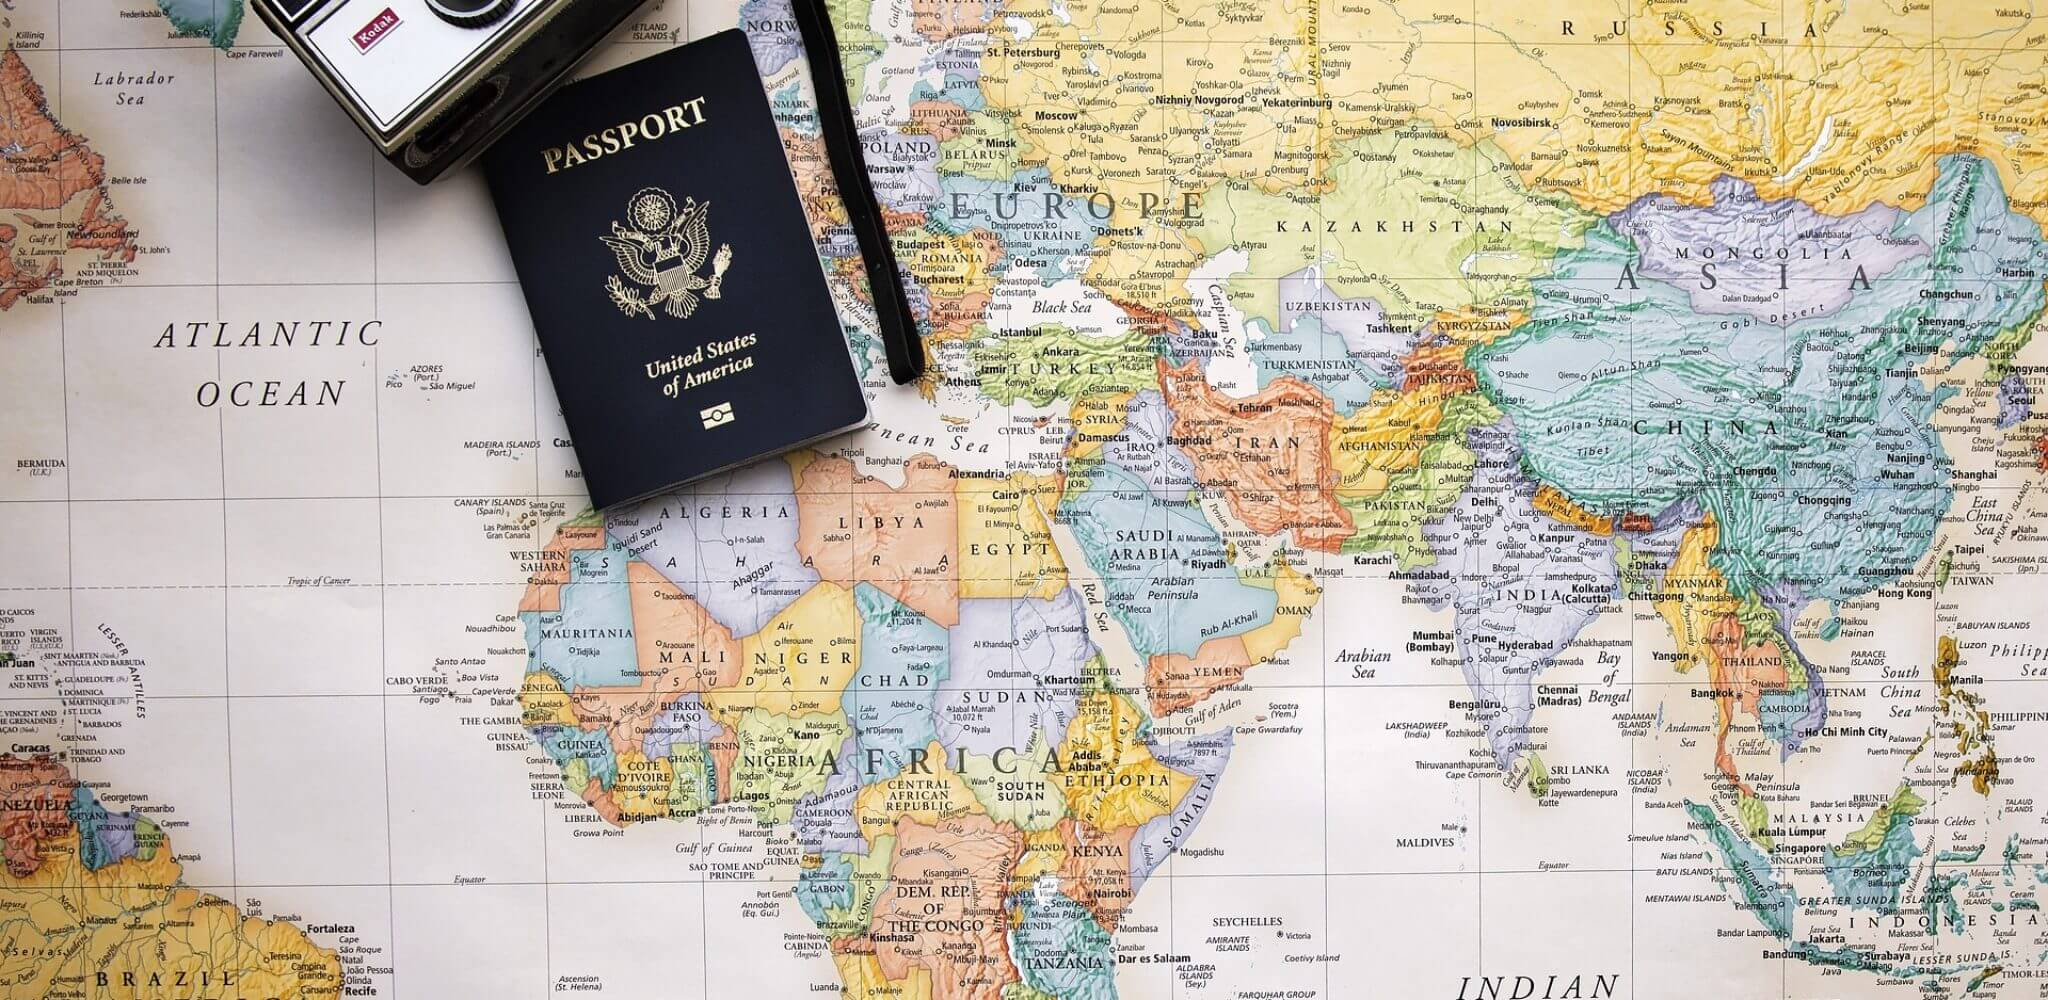 Vietnam Visa exemption for Egyptian citizens